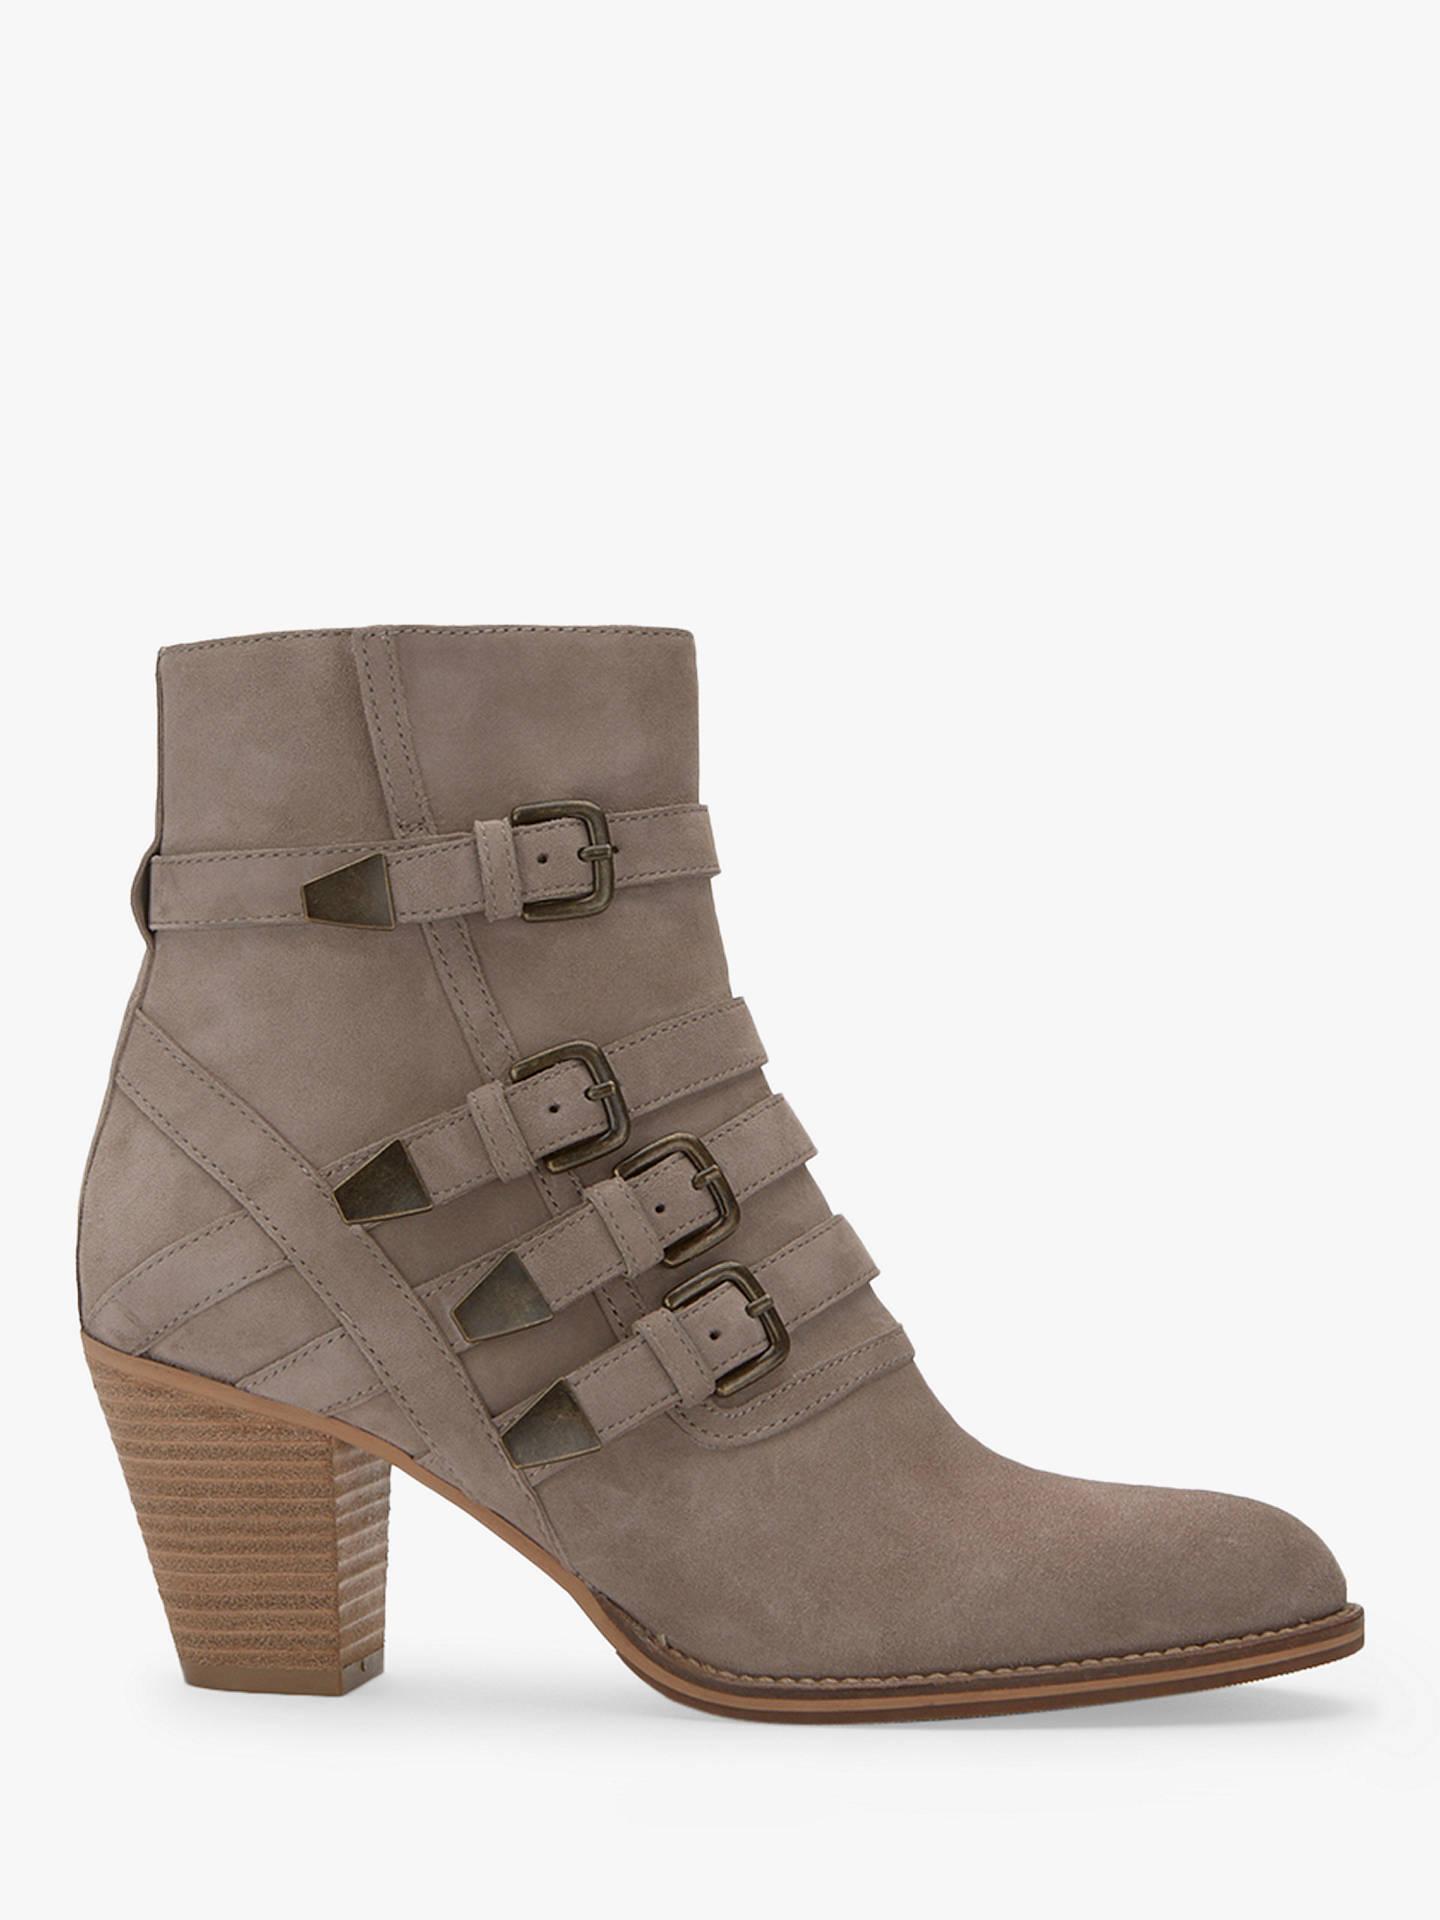 Mint Velvet Harriet Suede Buckle Ankle Boots Light Grey 3 Online At Johnlewis